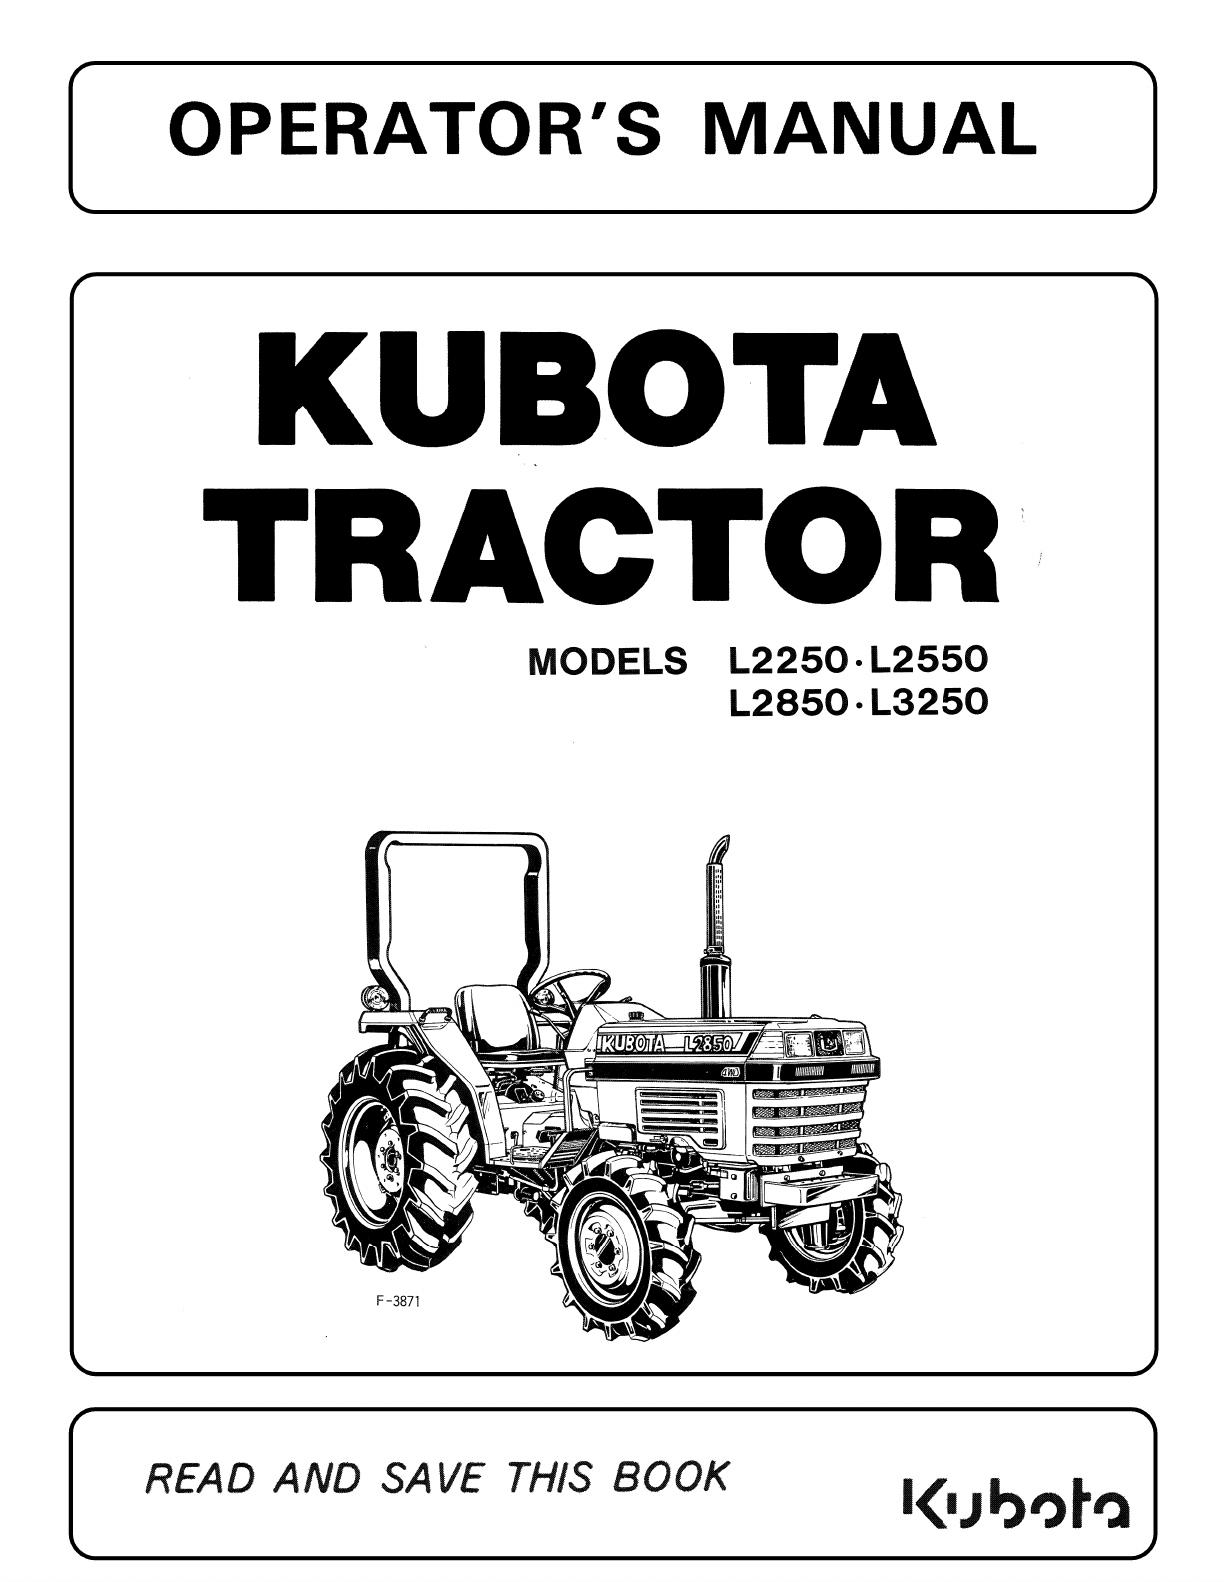 Manual Kubota L3250 Page 1 Of 68 English